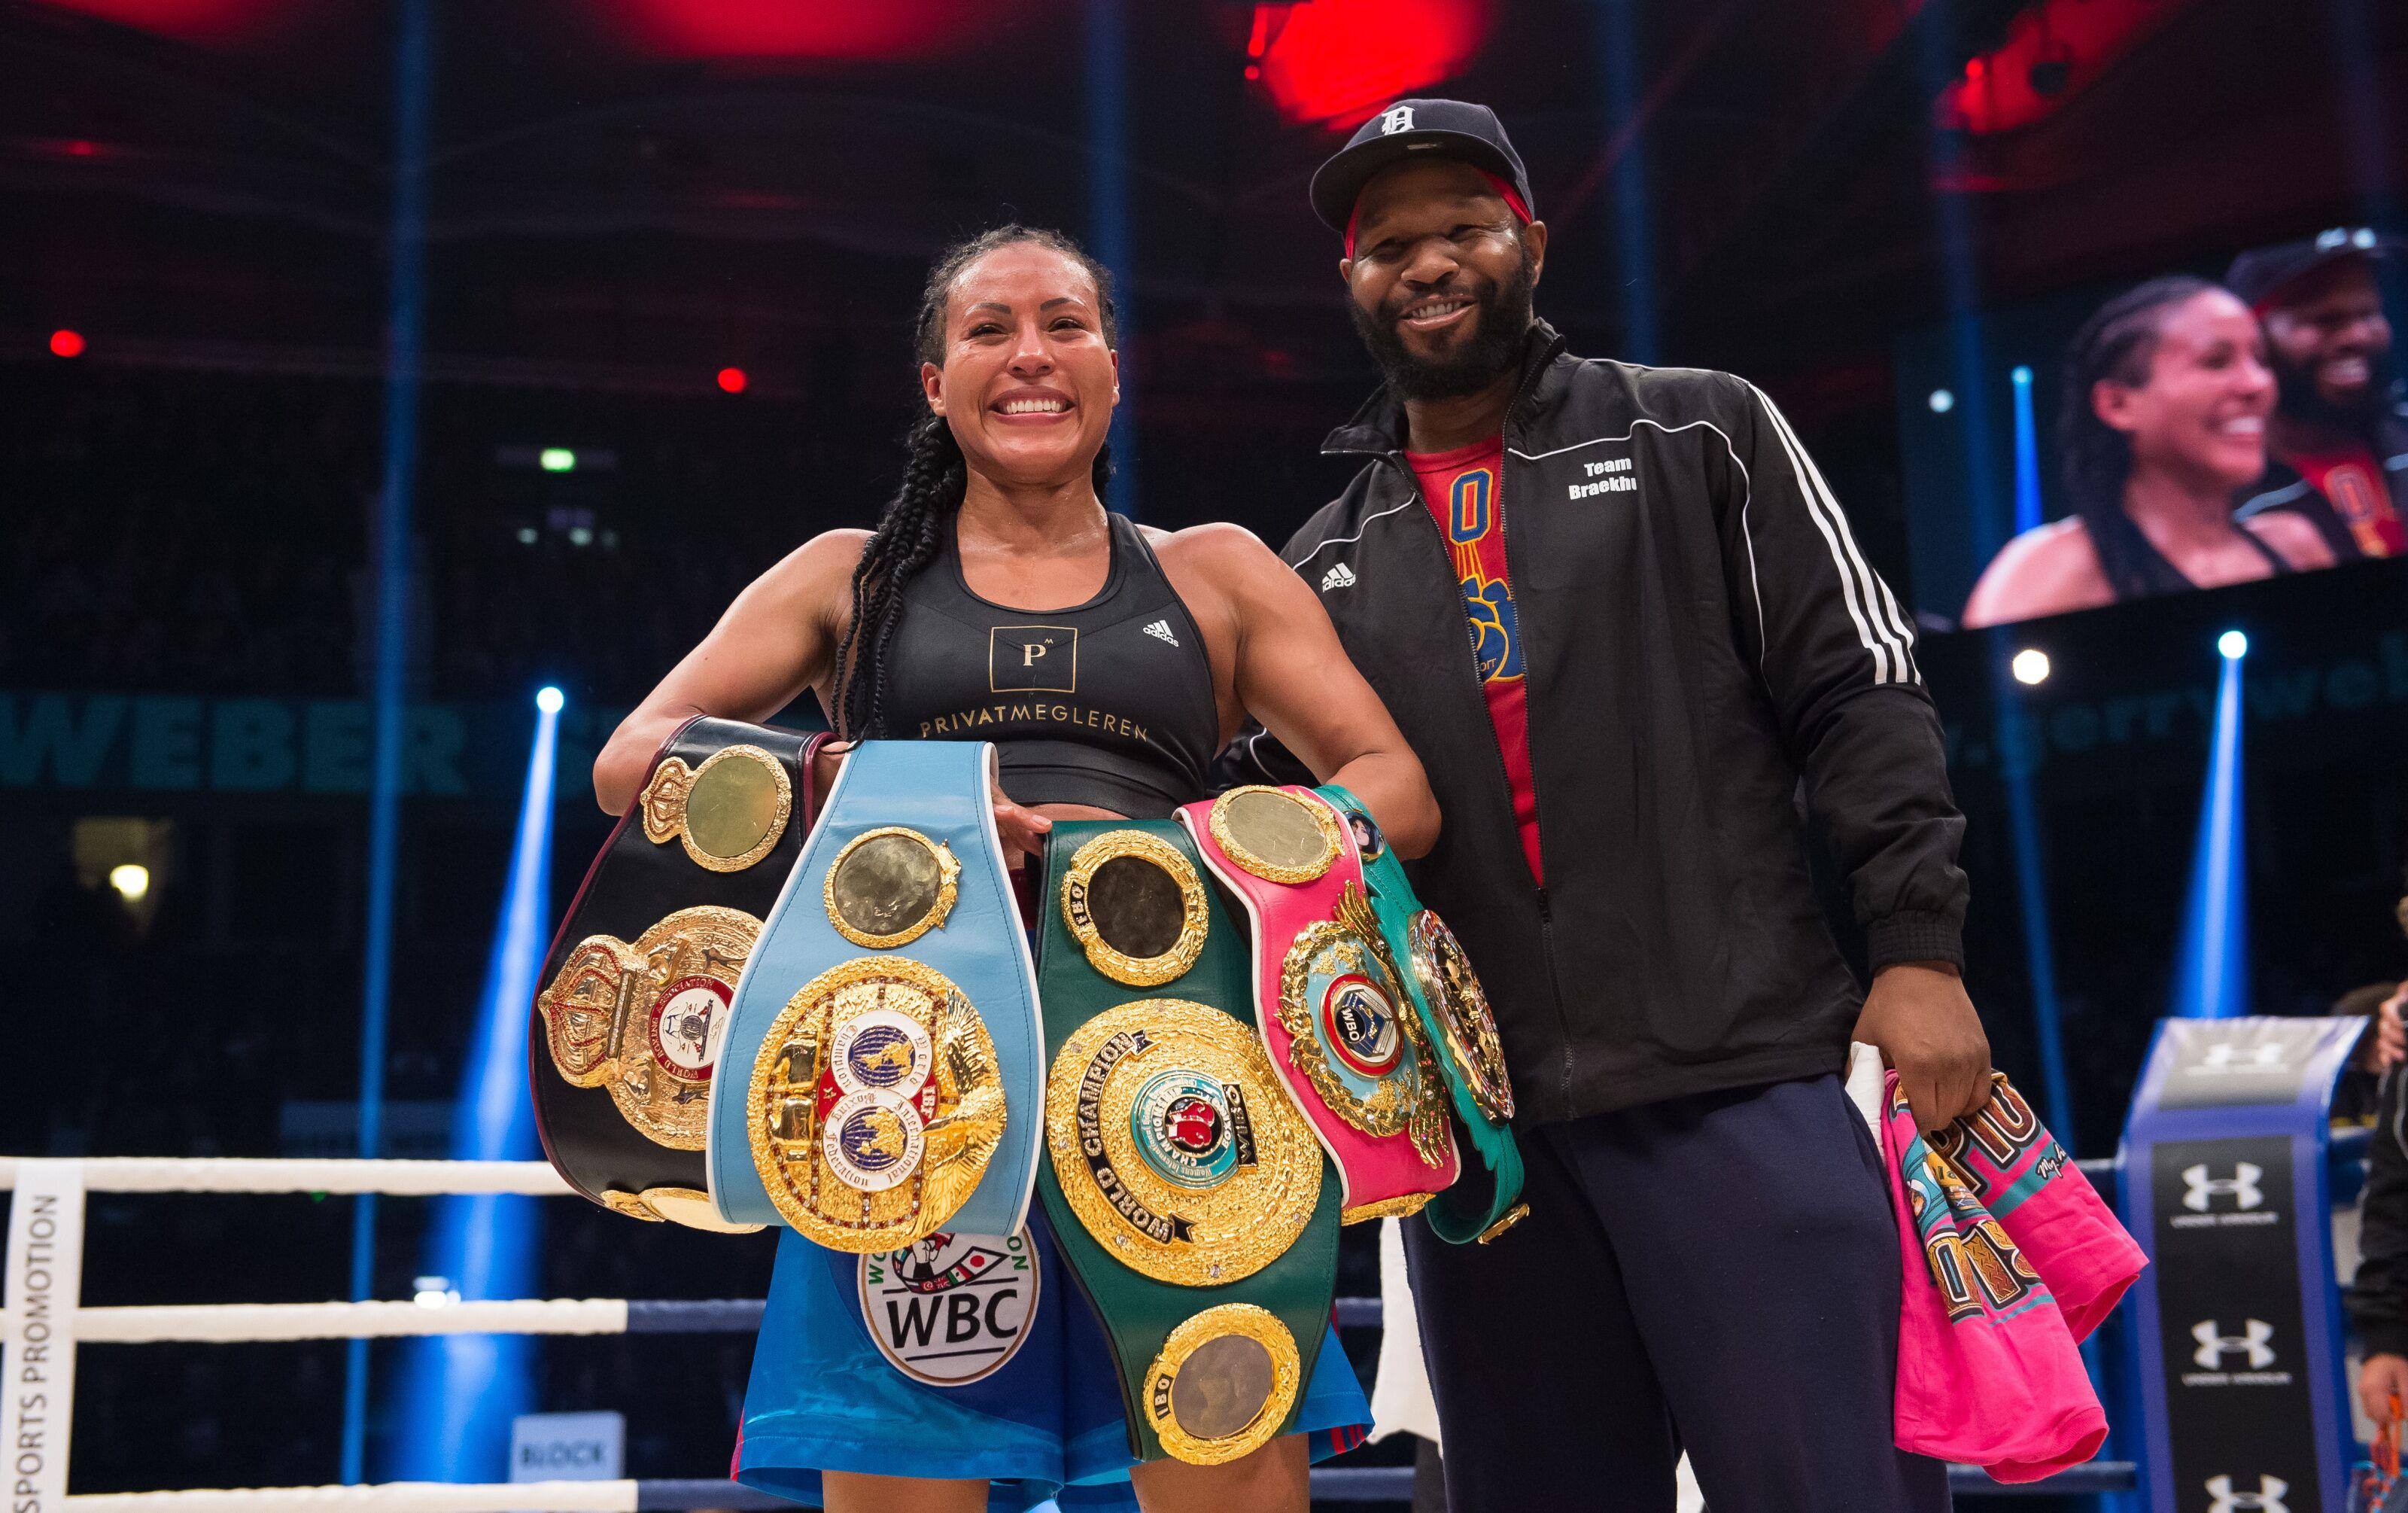 Cecilia Braekhus leading a women's revolution in boxing